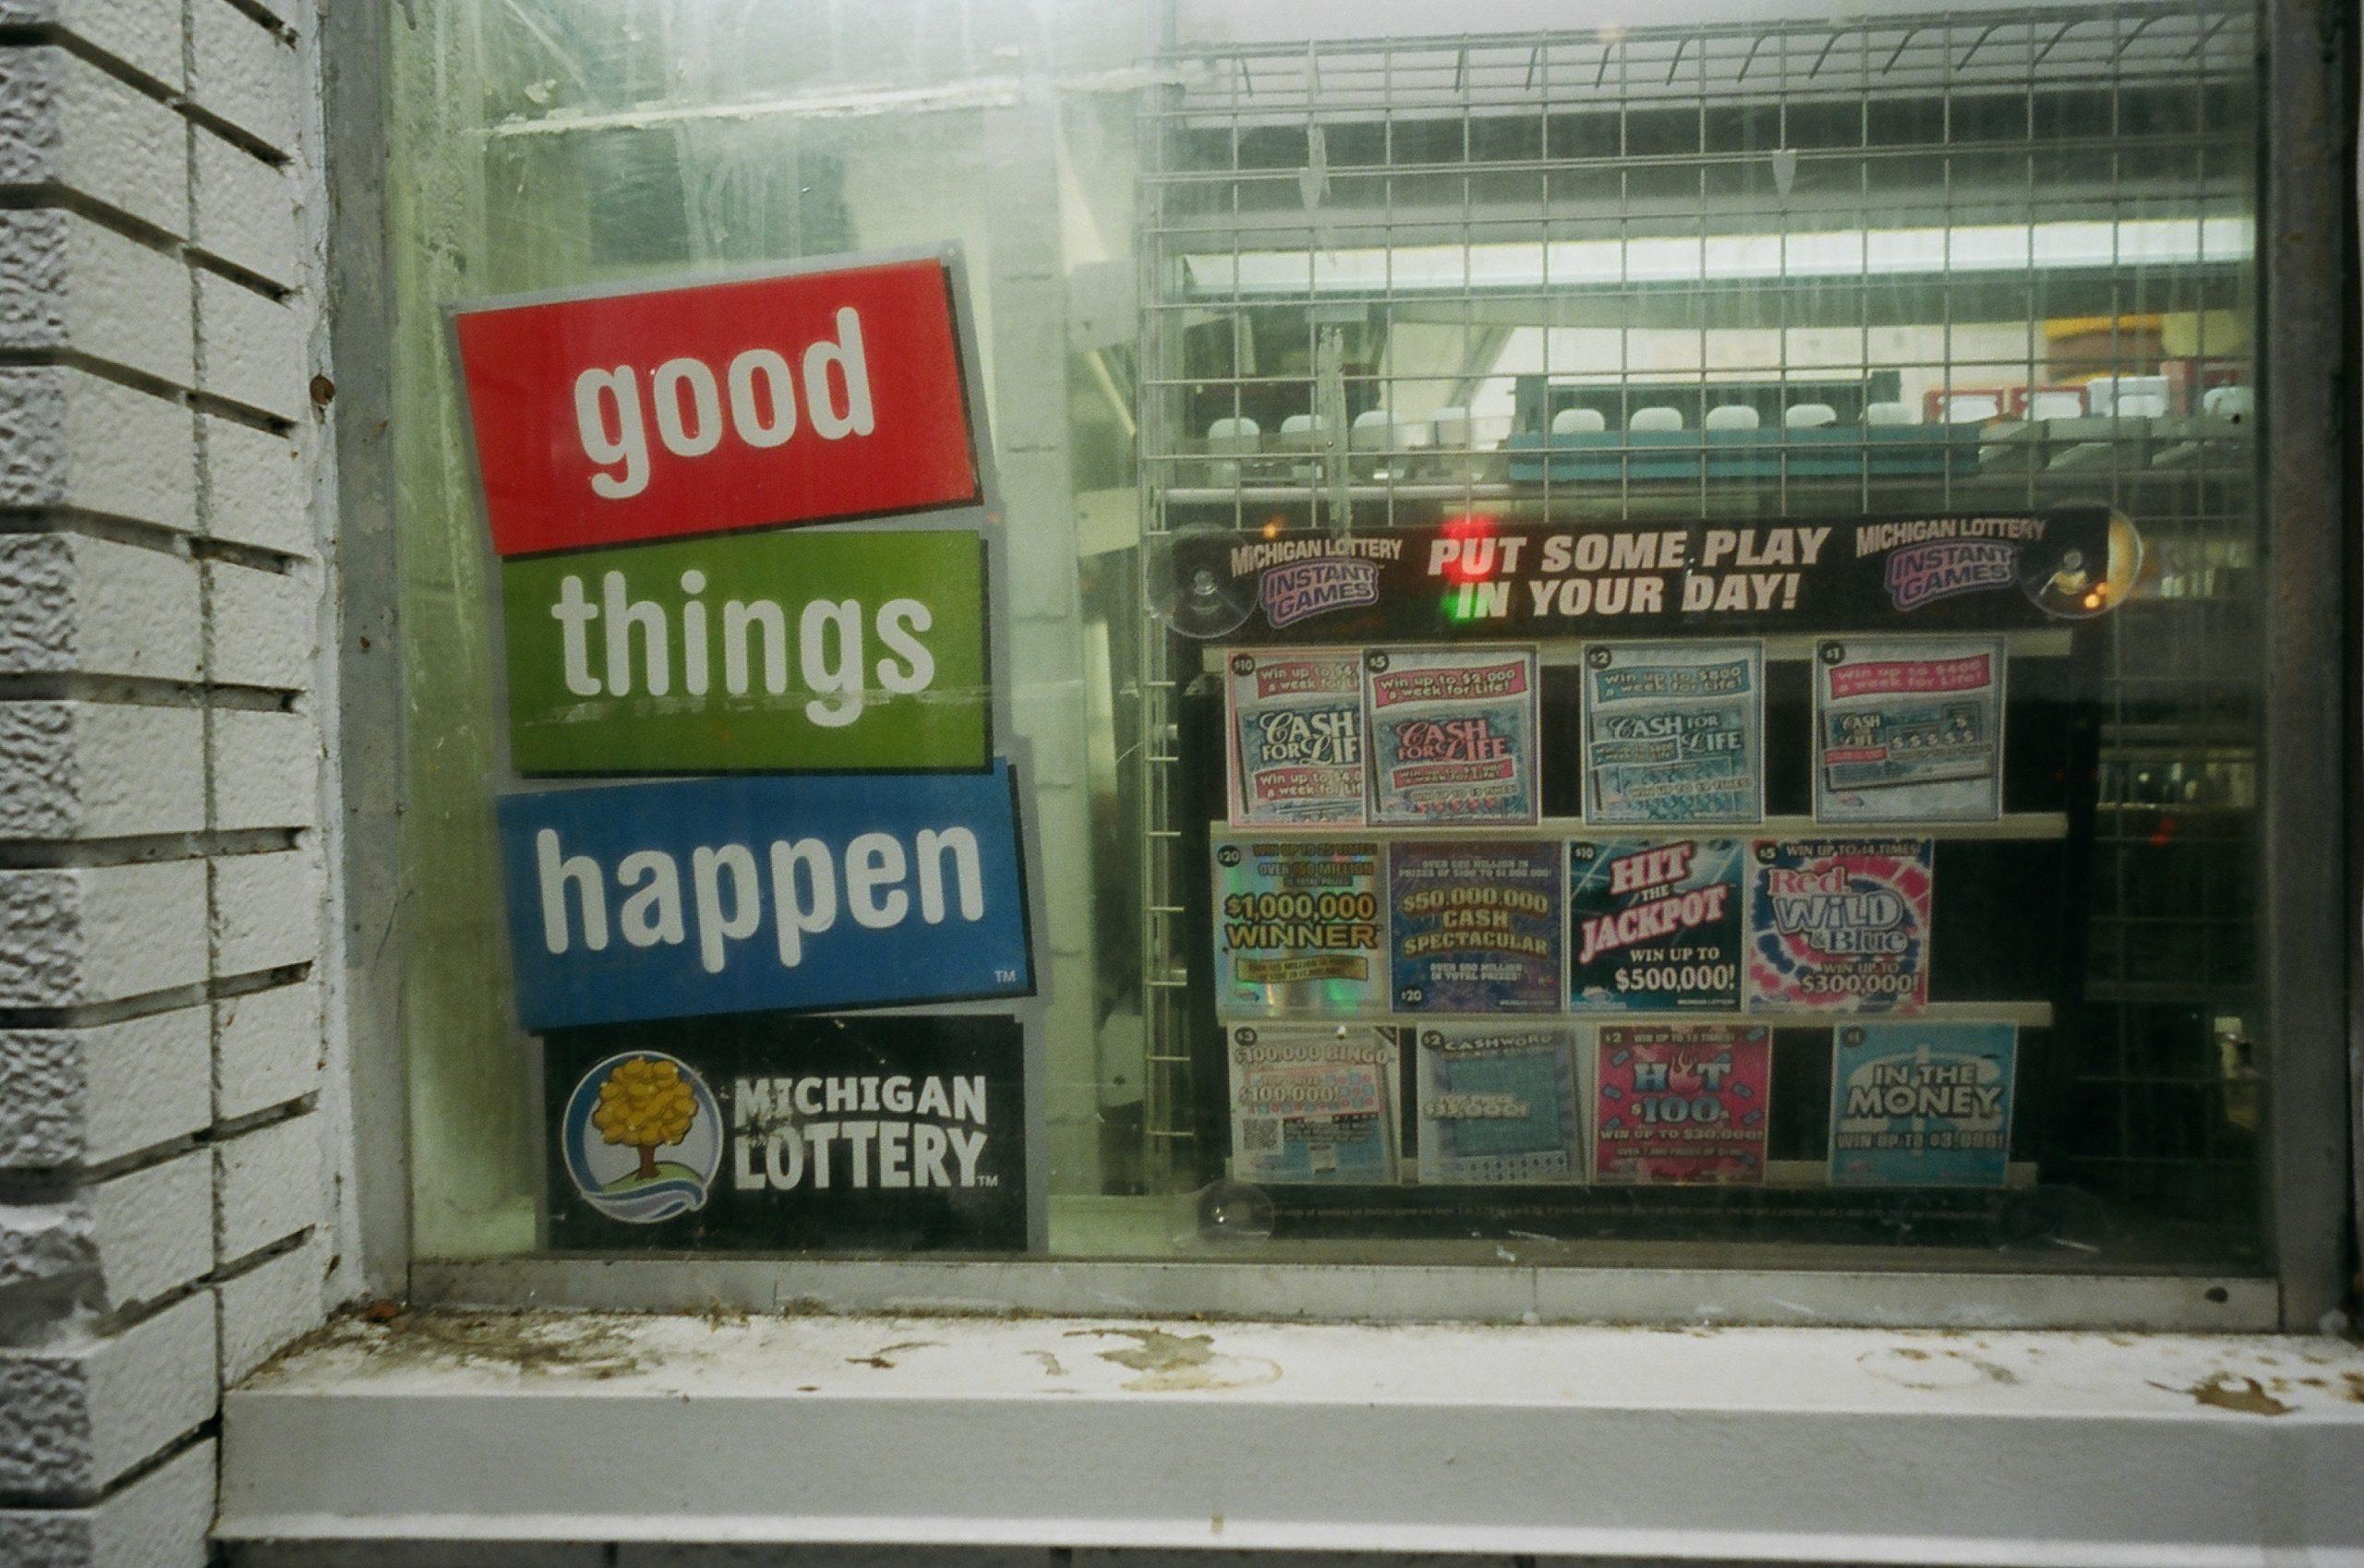 """Good things happen"". Michigan lottery, 2013"